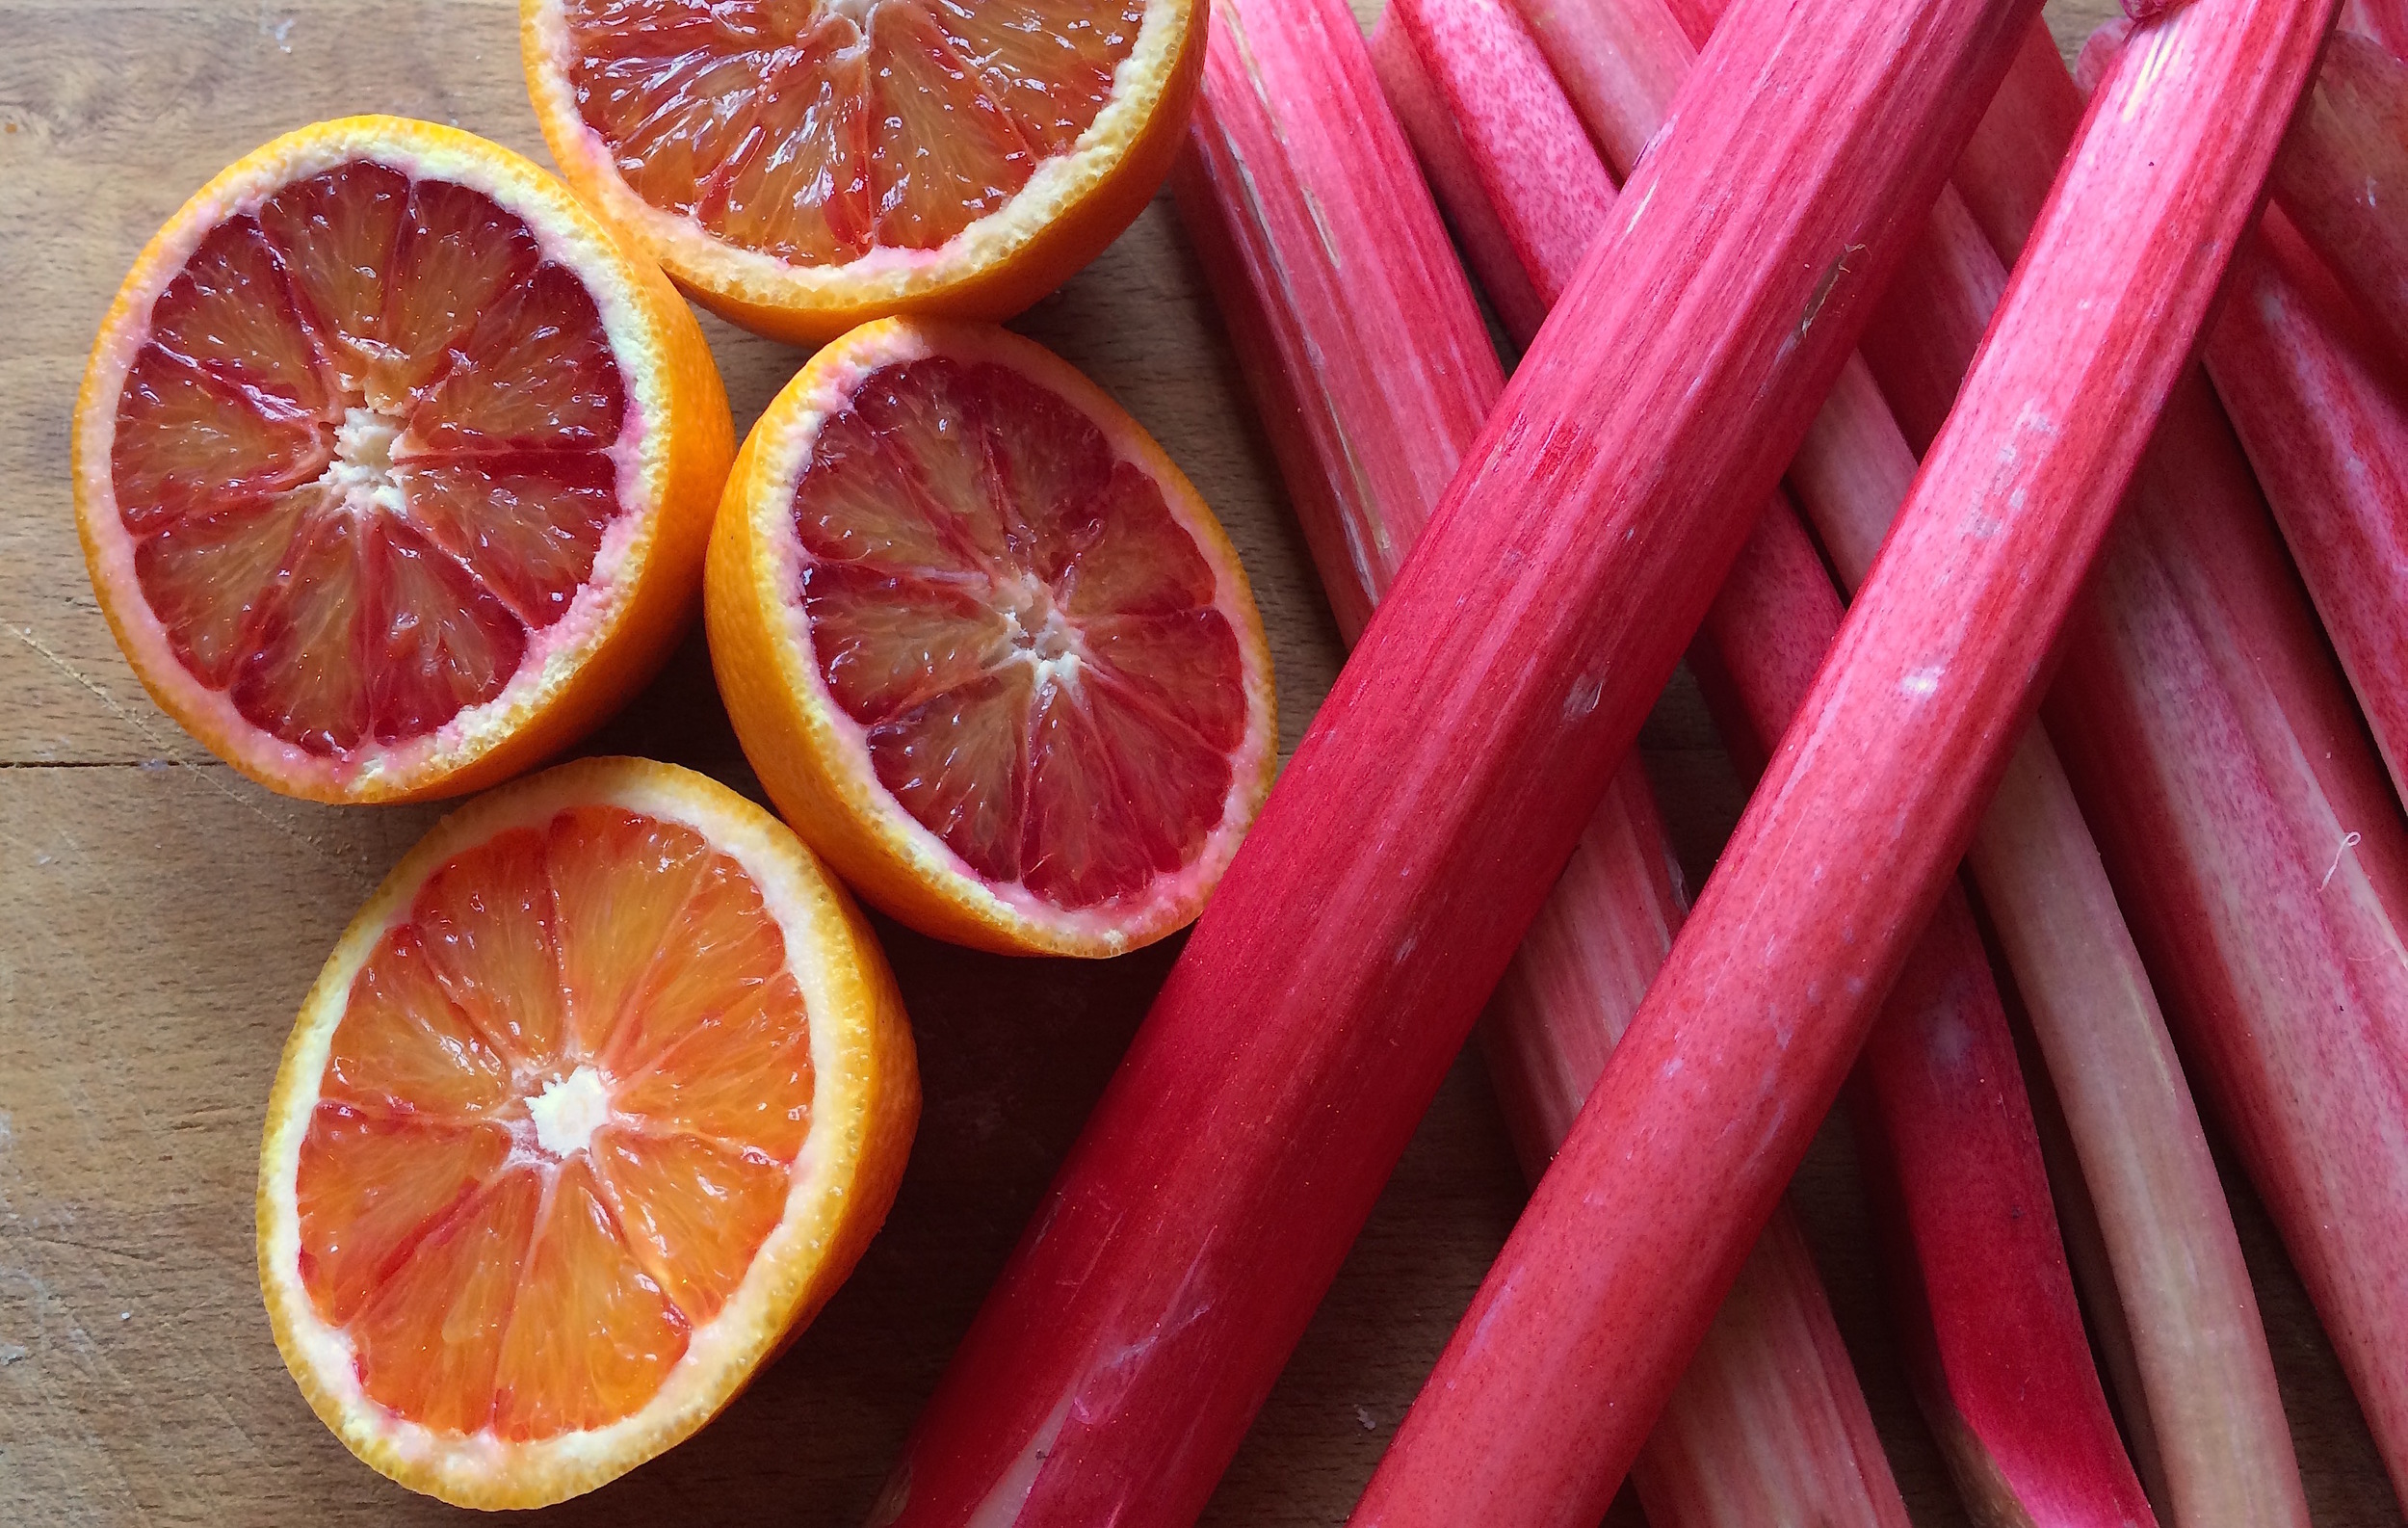 rhubarbs and bood oranges